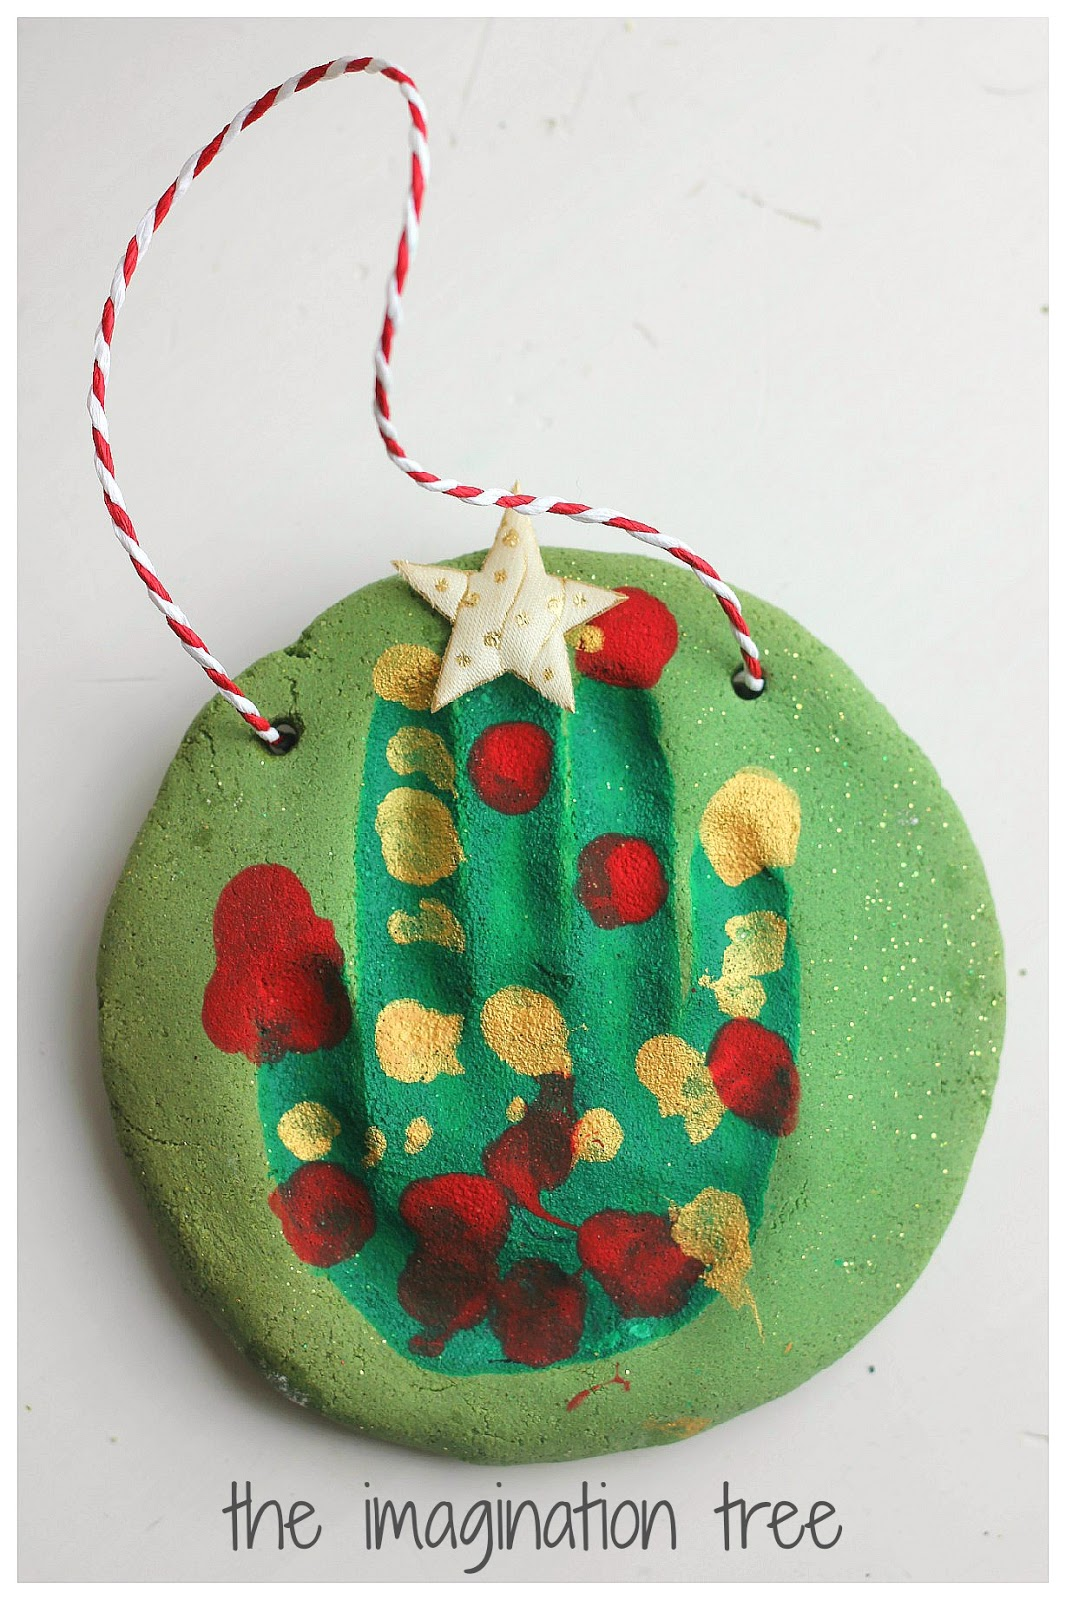 Love Handprint Ideas? See More Here: Collaborative Handprint Christmas Tree